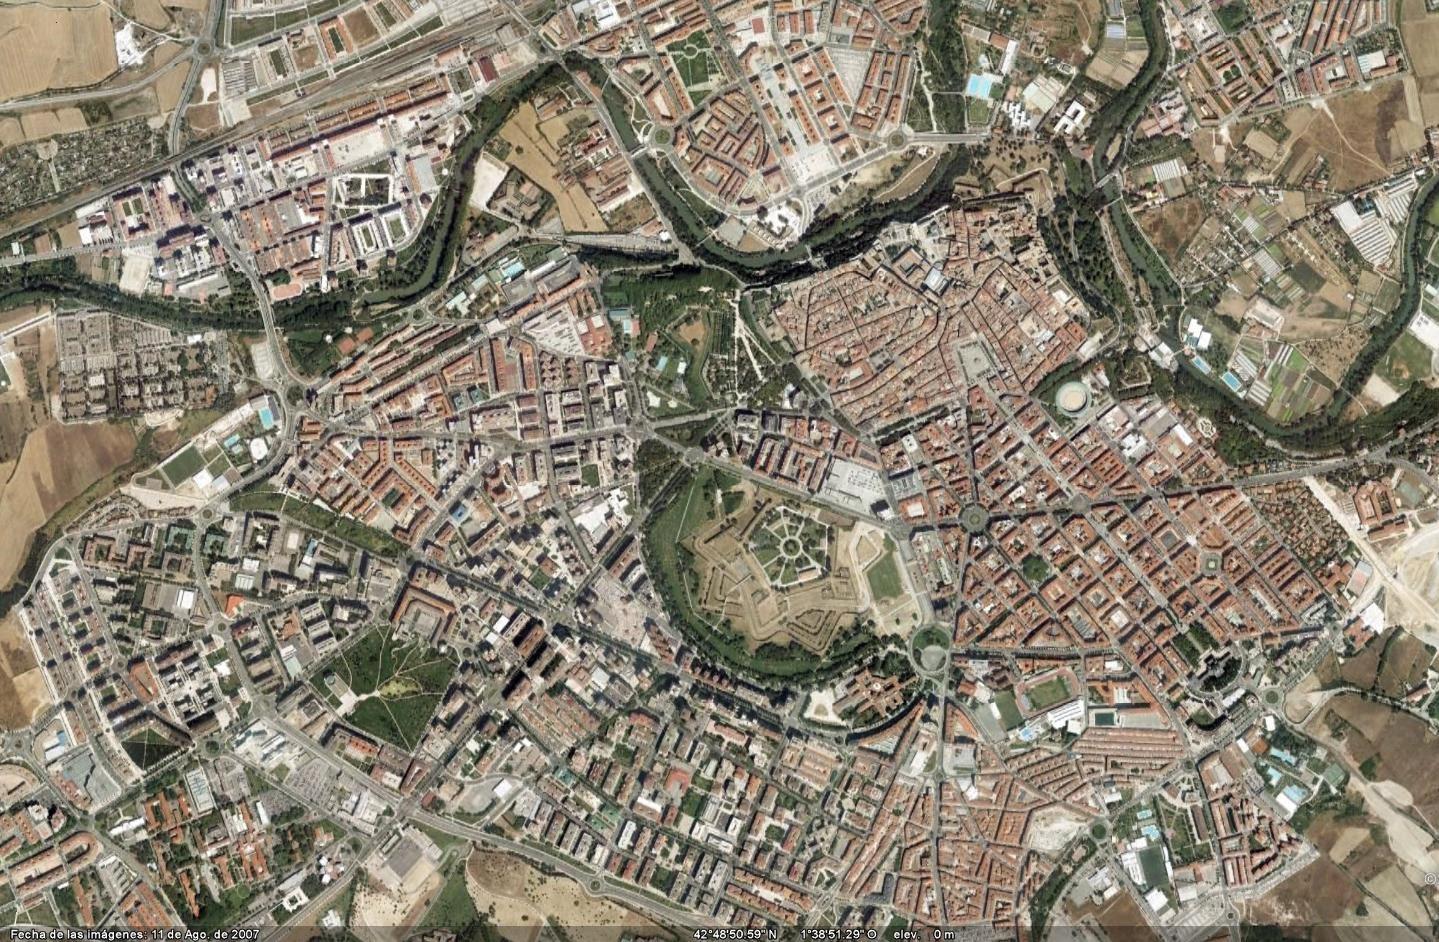 Plano urbano de Pamplona